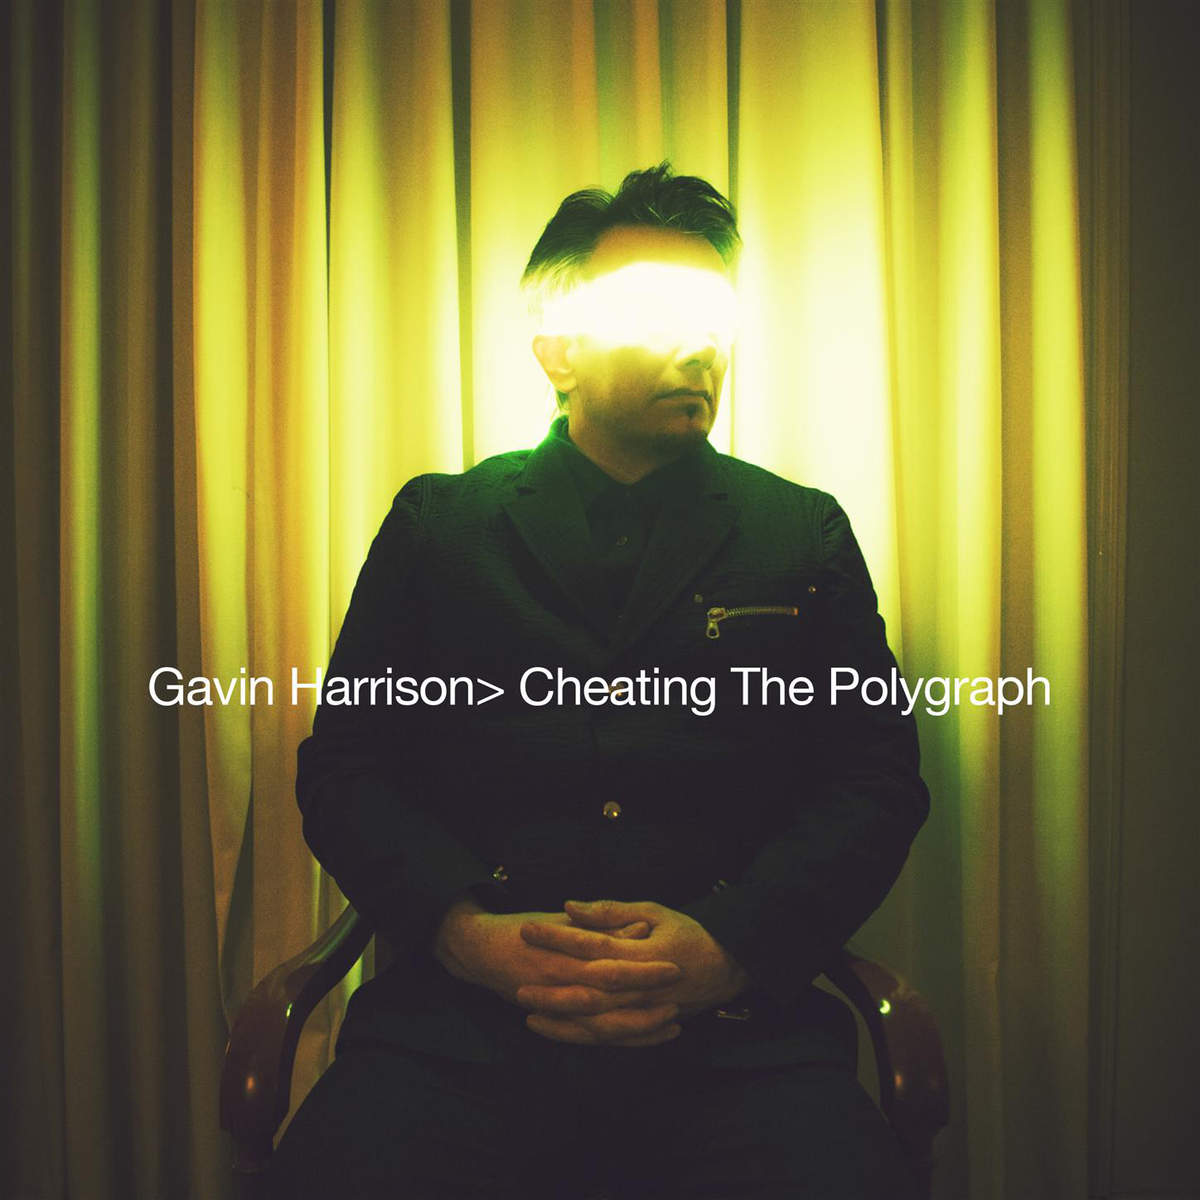 Gavin Harrison: Cheating the Polygraph